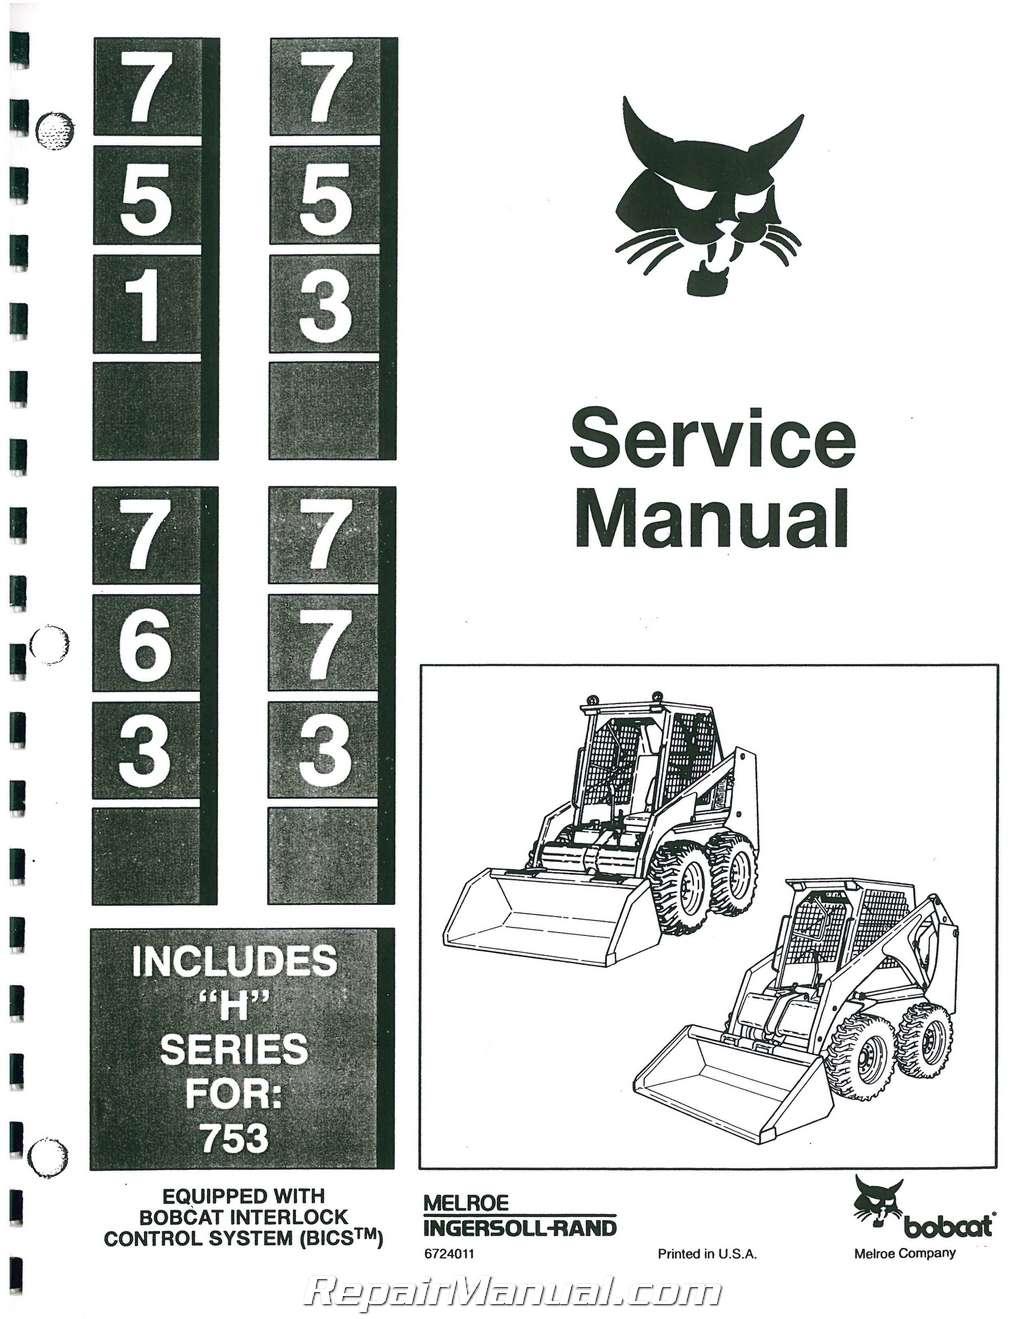 Bobcat 763 H Service Repair Manual 843 Wiring Diagram 751 753 773 Includes Series For Rh Repairmanual Com Hydraulic Schematic Pdf